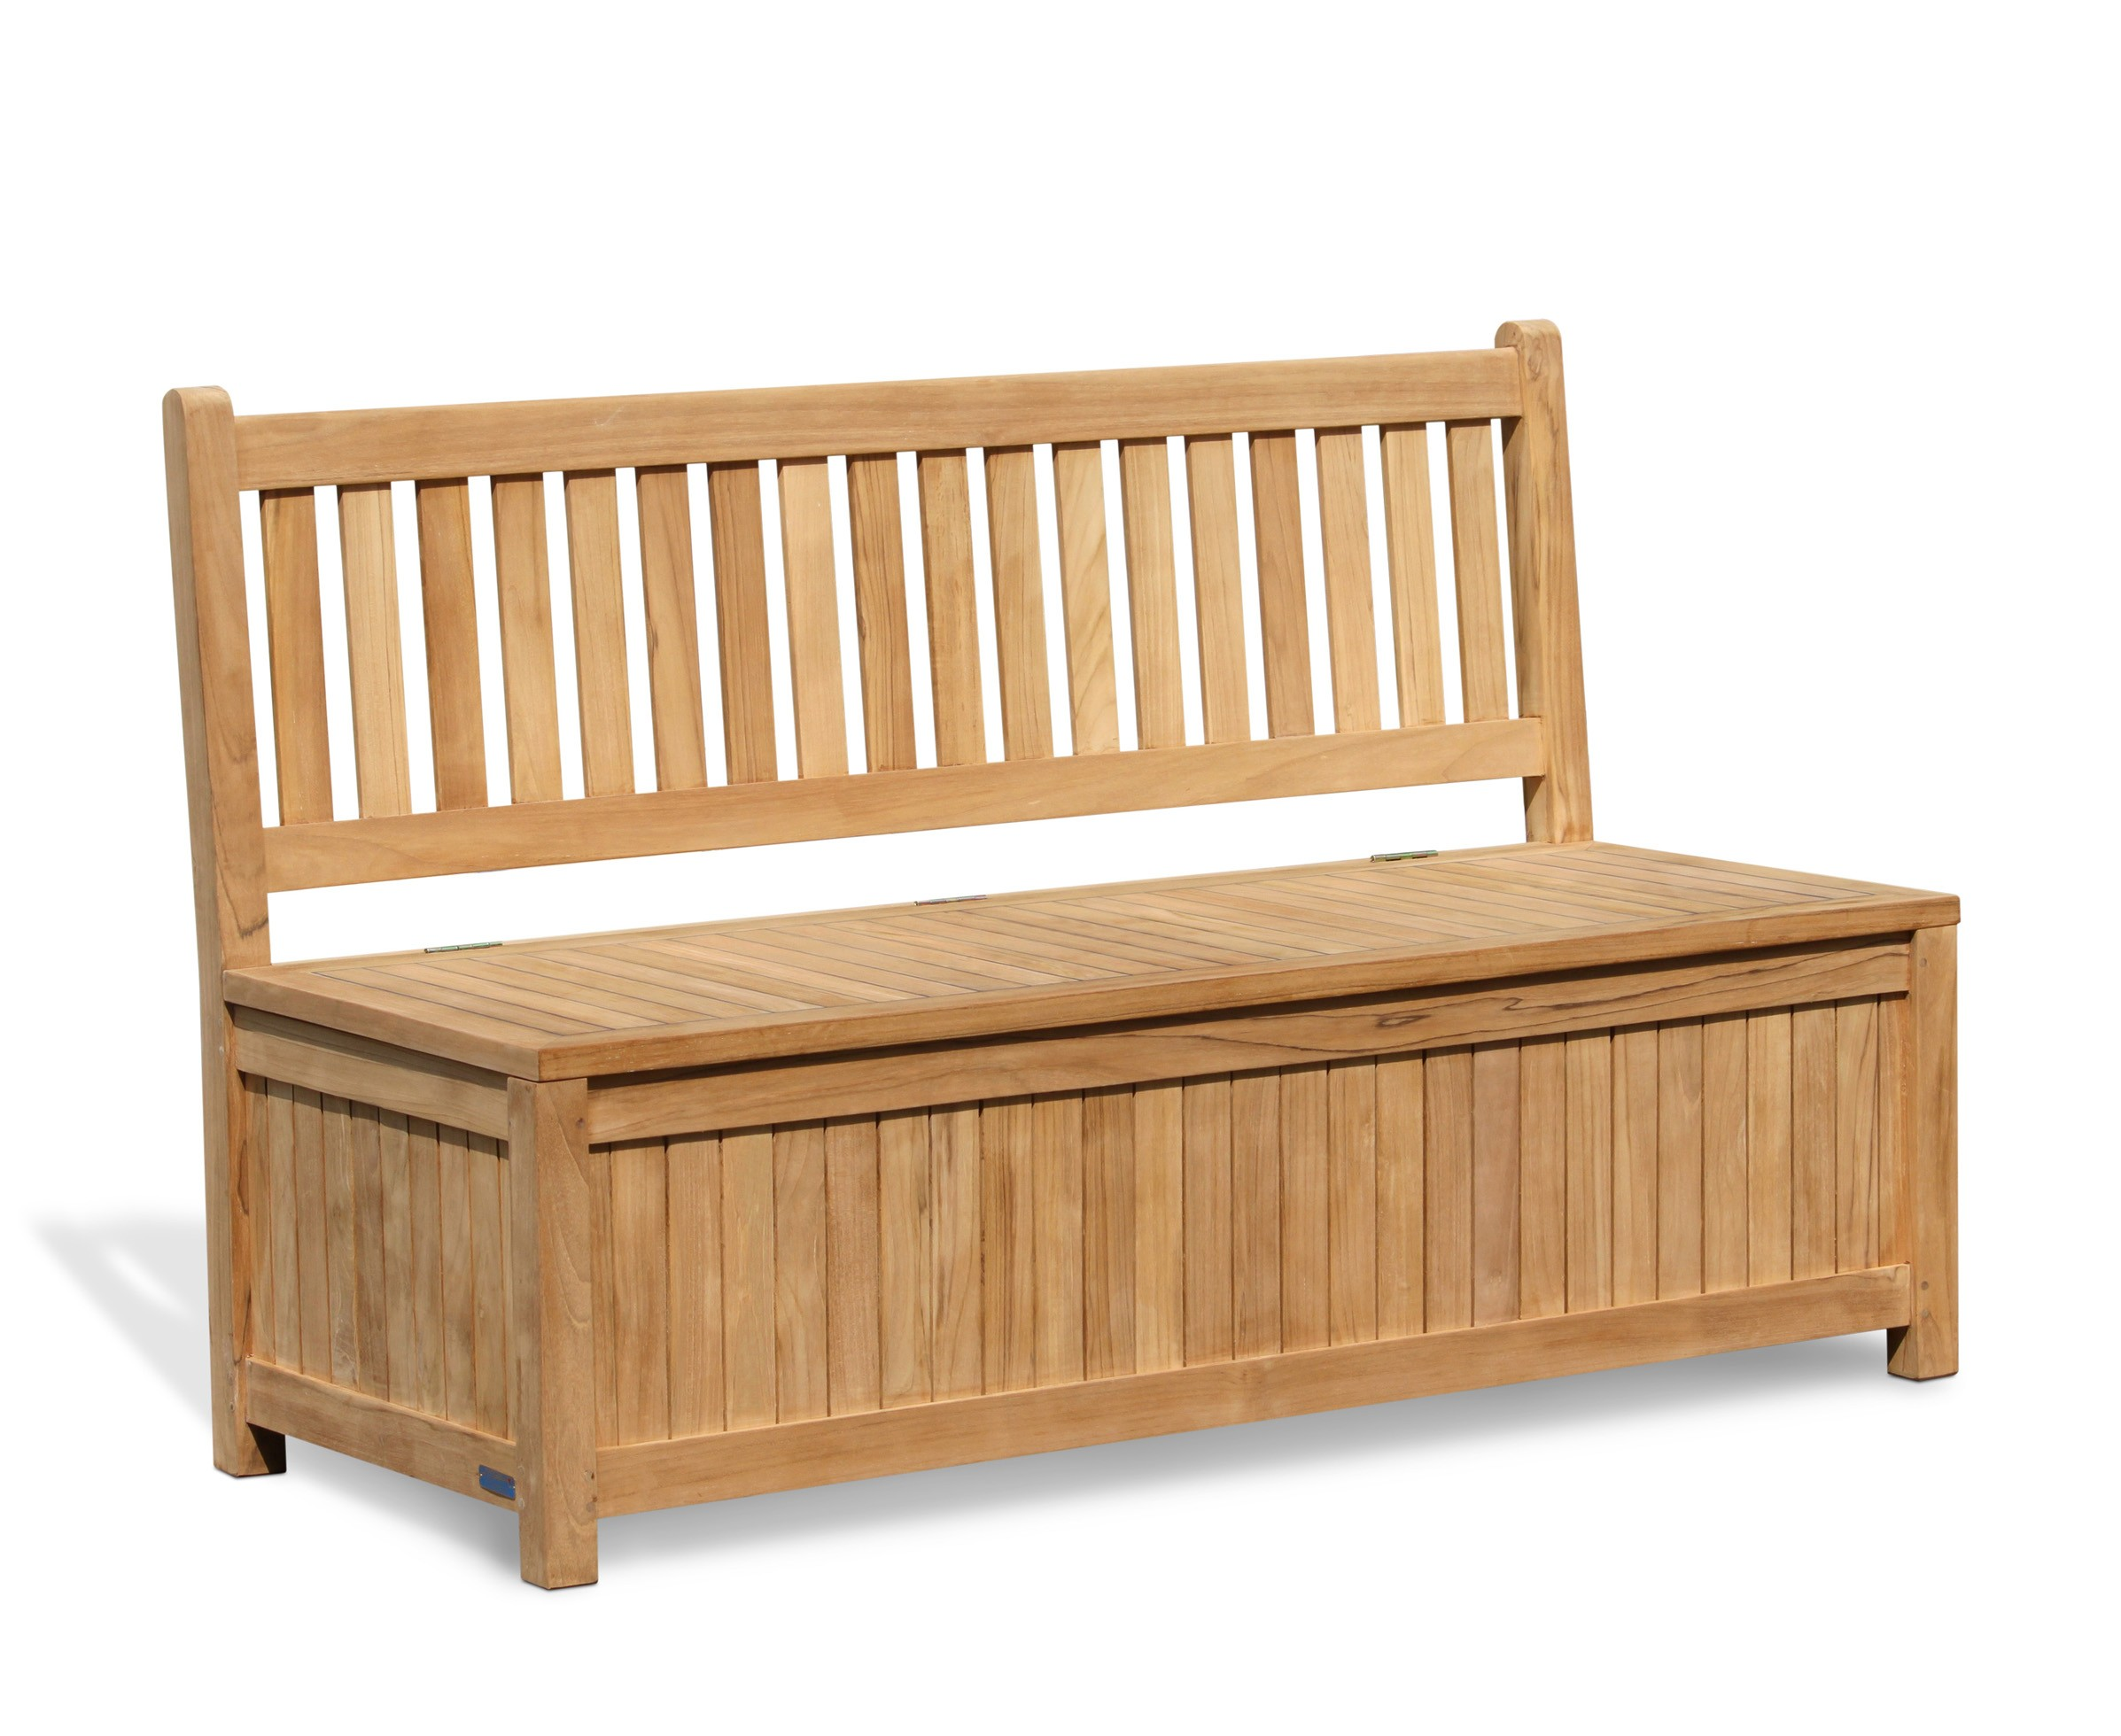 Pleasant Balmoral Wooden Bench Balmoral Bench Classic Teak Balmoral Ibusinesslaw Wood Chair Design Ideas Ibusinesslaworg